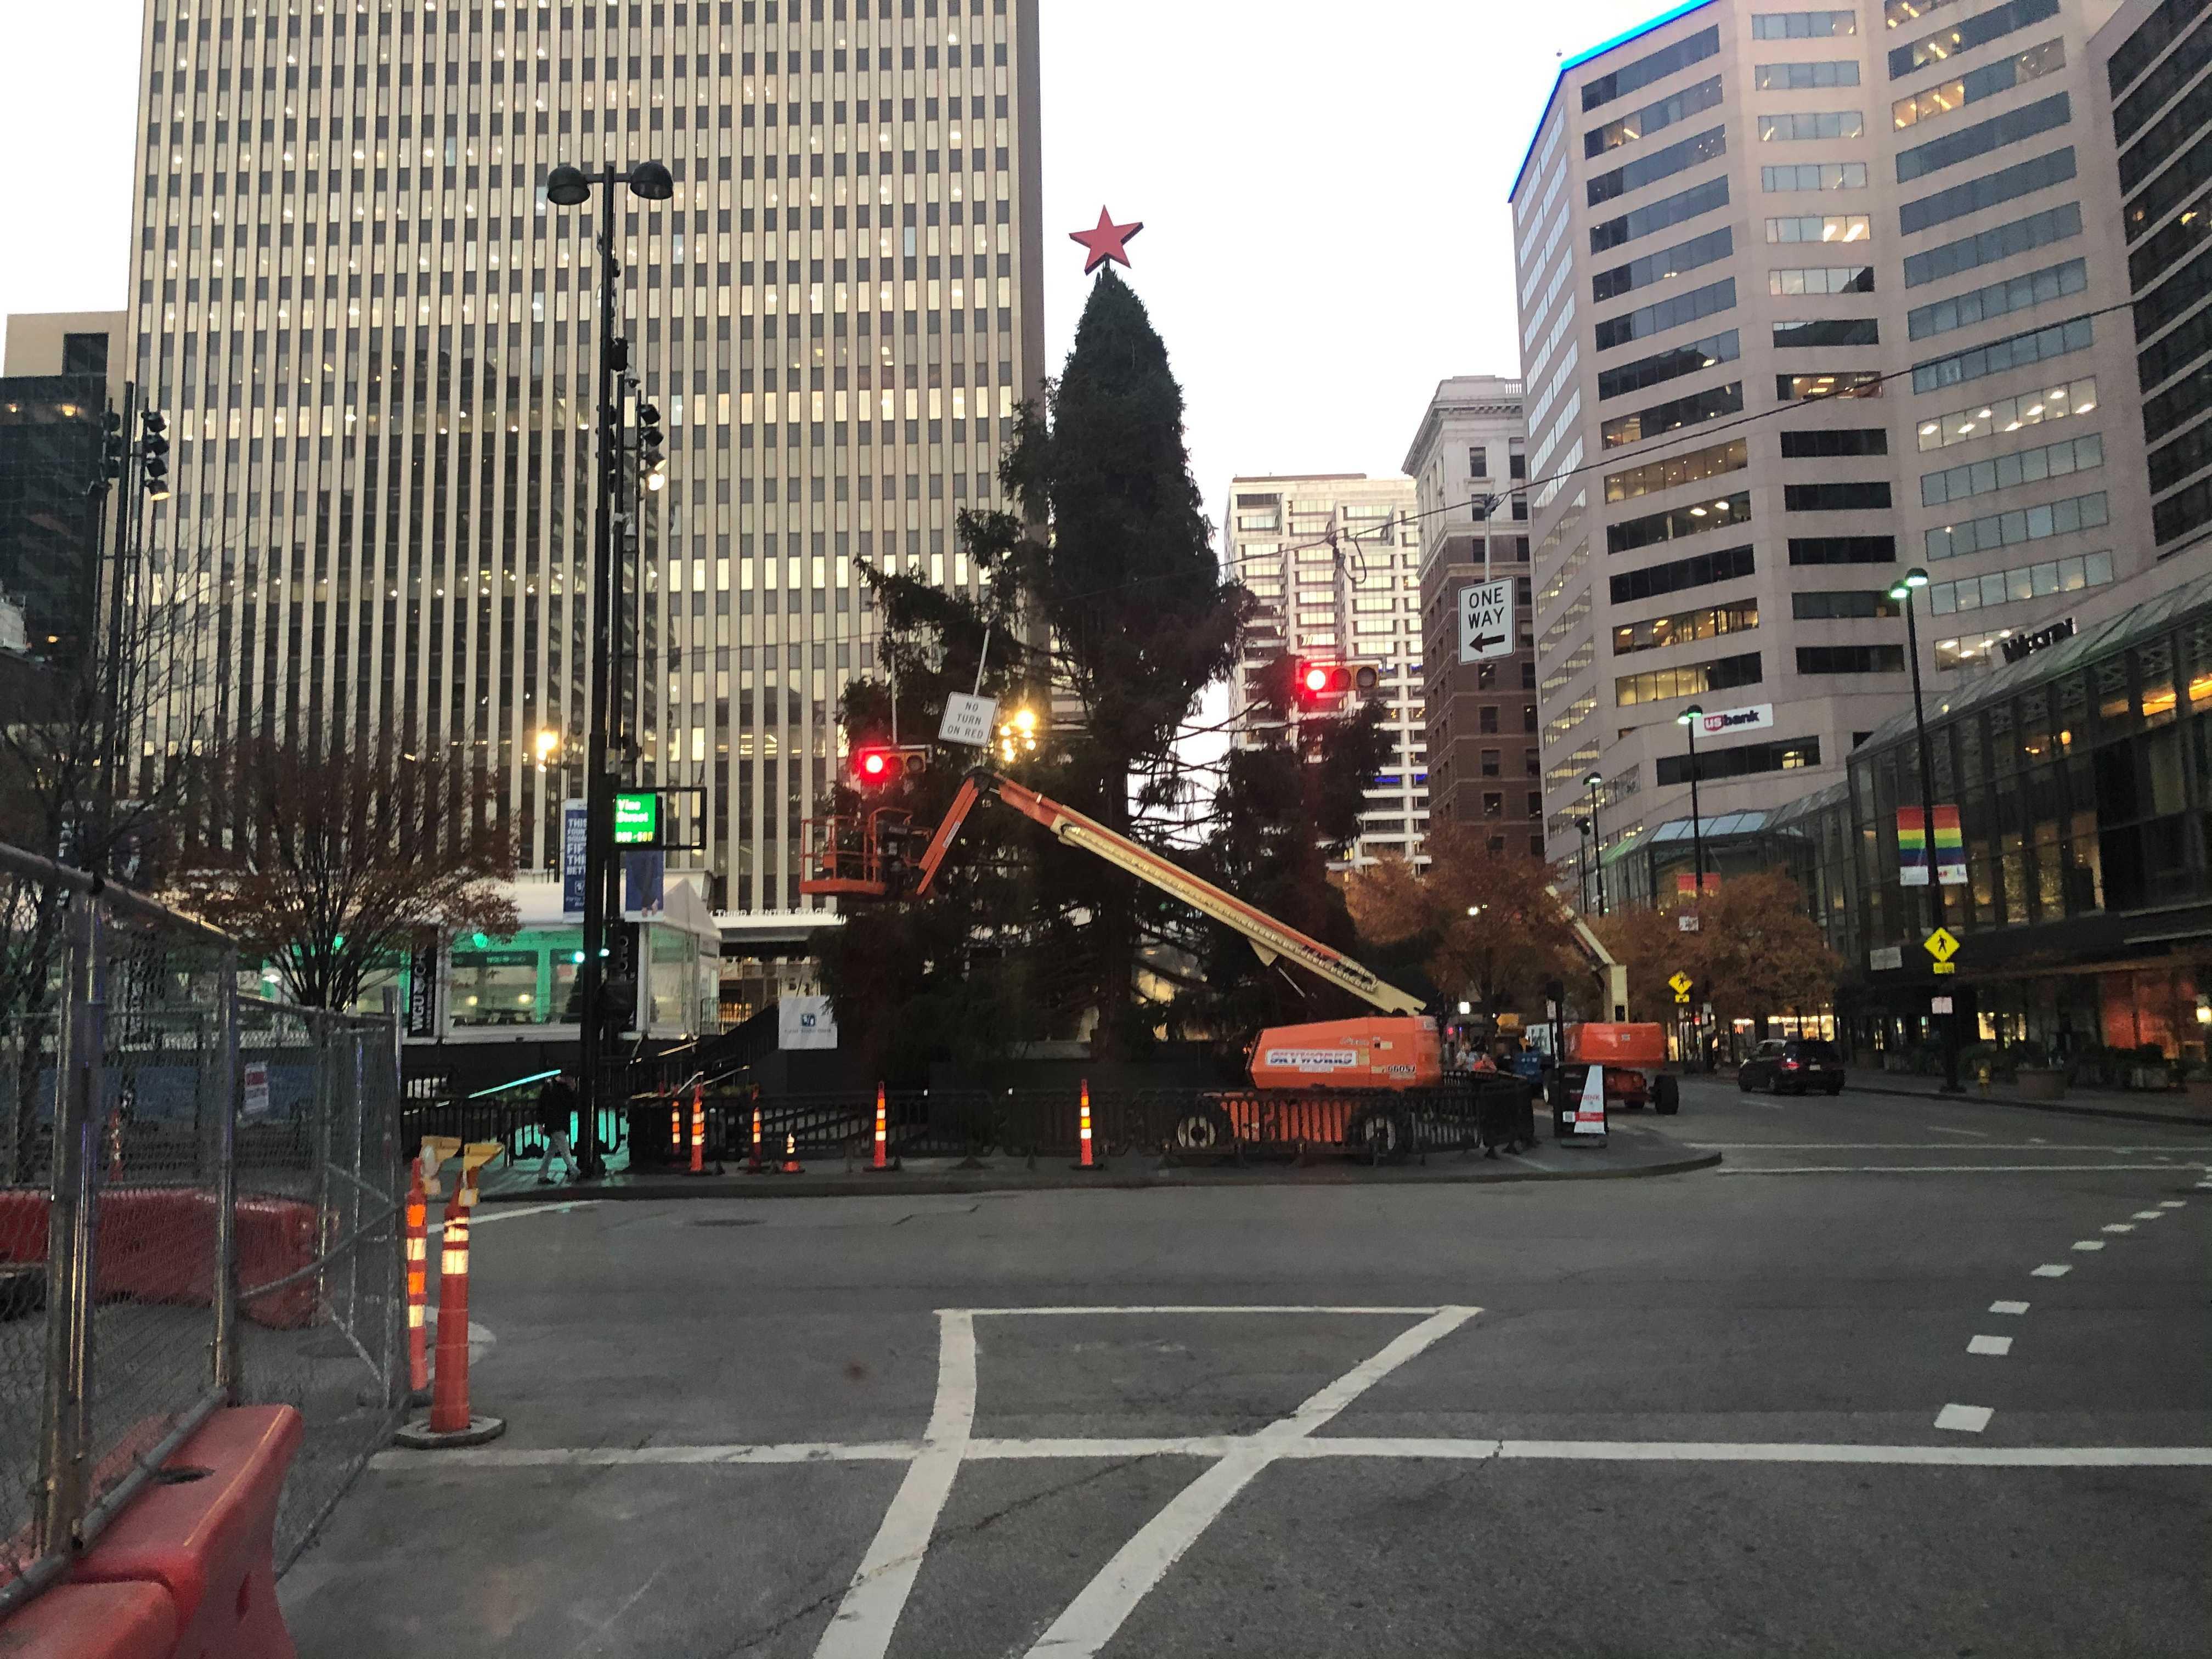 Relax, Cincinnati. The Macy's Holiday Tree on Fountain Square isn